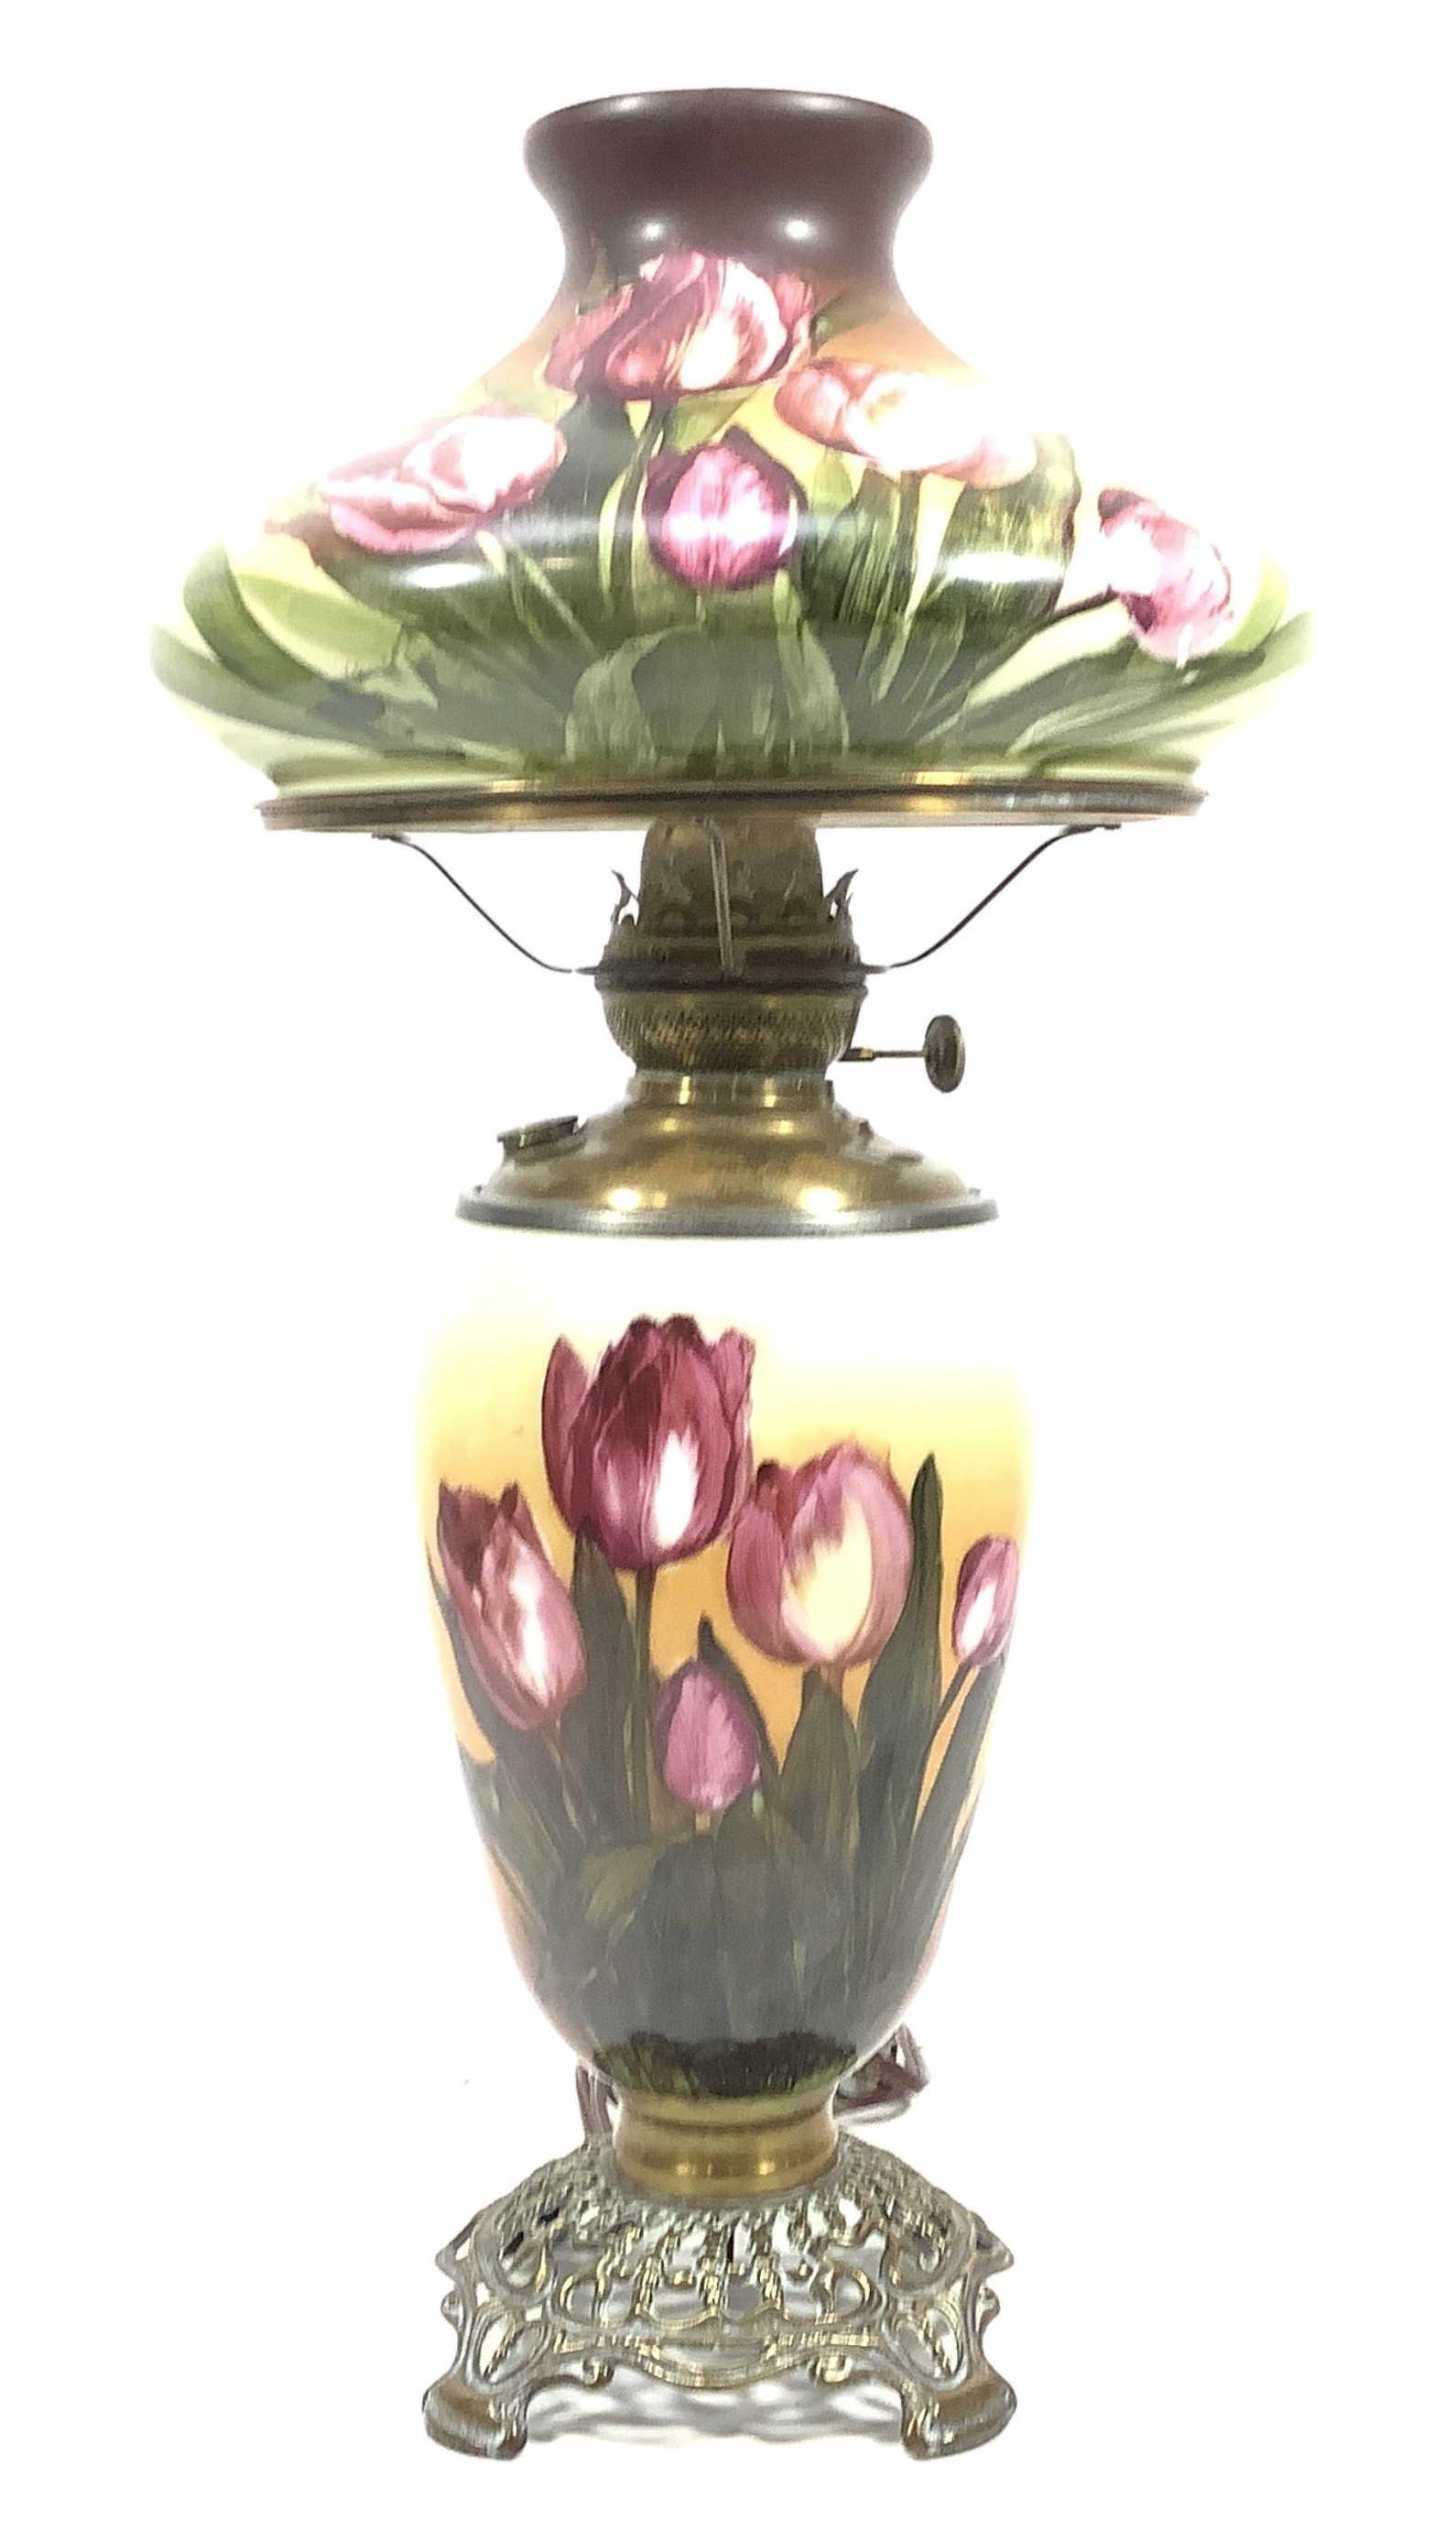 c.1890 Hand Painted Kerosene Table Lamp, Tulips